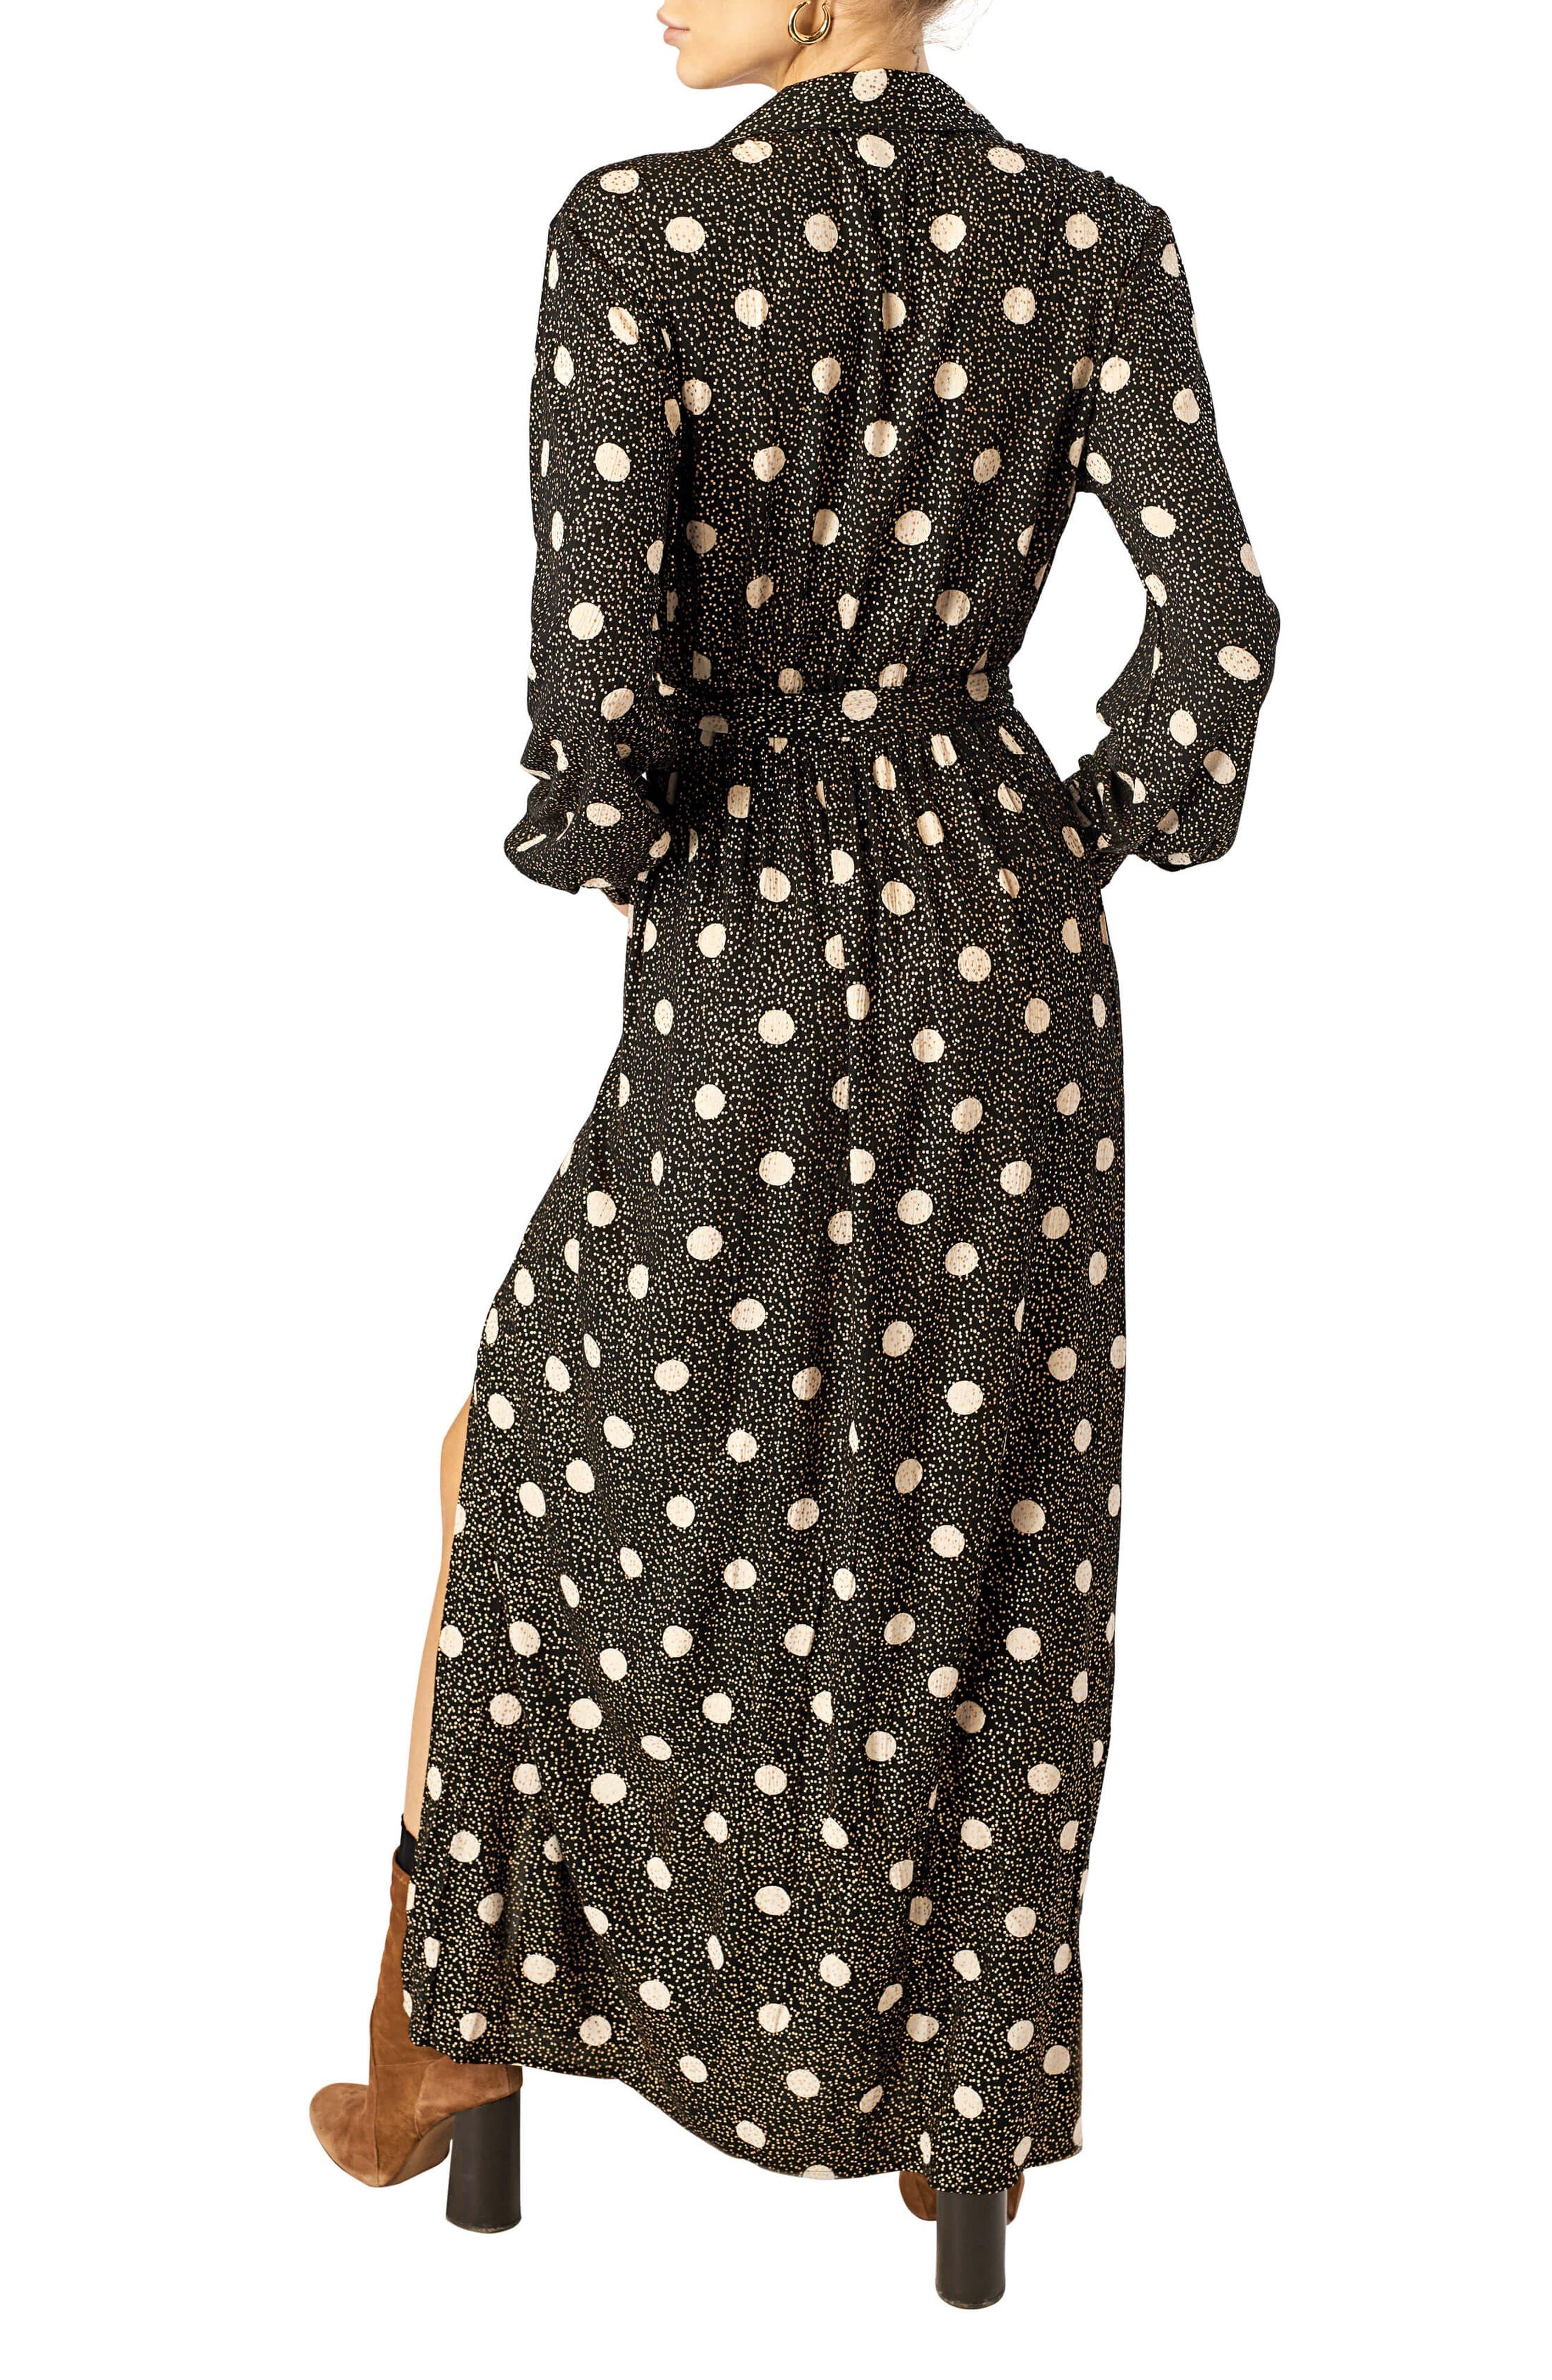 STONE ROW,                             Smoka Dot Surplice Maxi Dress,                             Alternate thumbnail 2, color,                             BLACK COMBO